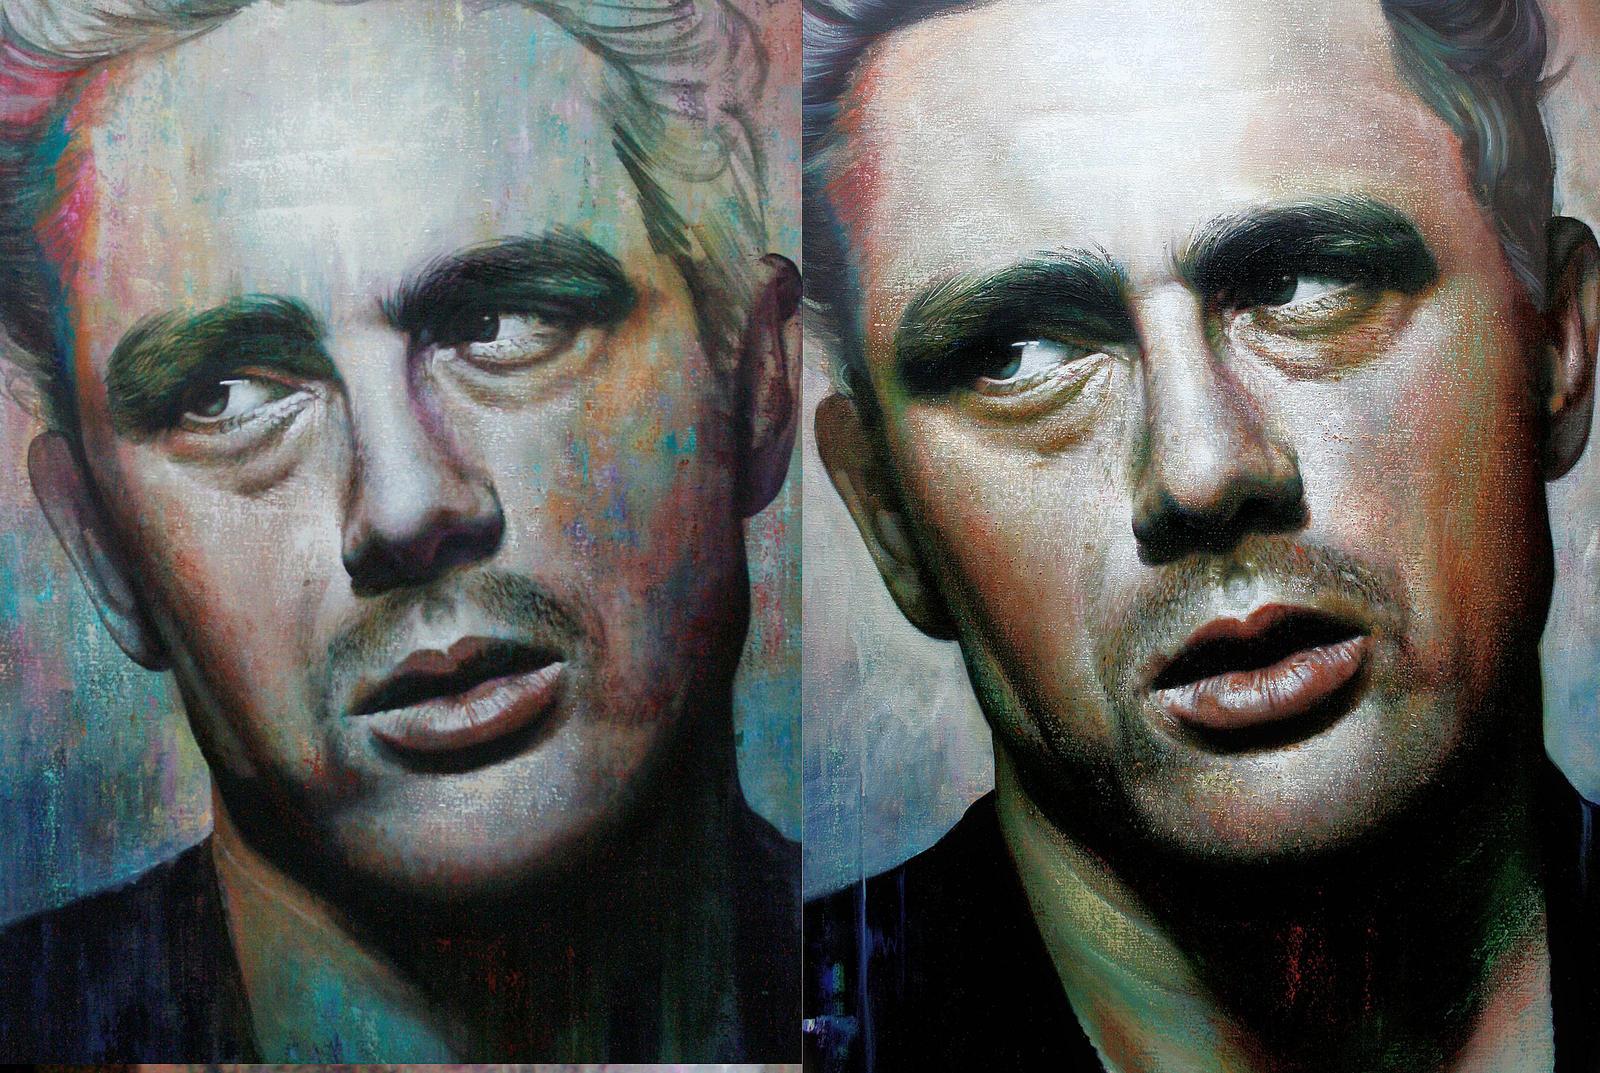 Acrylic's versus oilpaint by Raipun